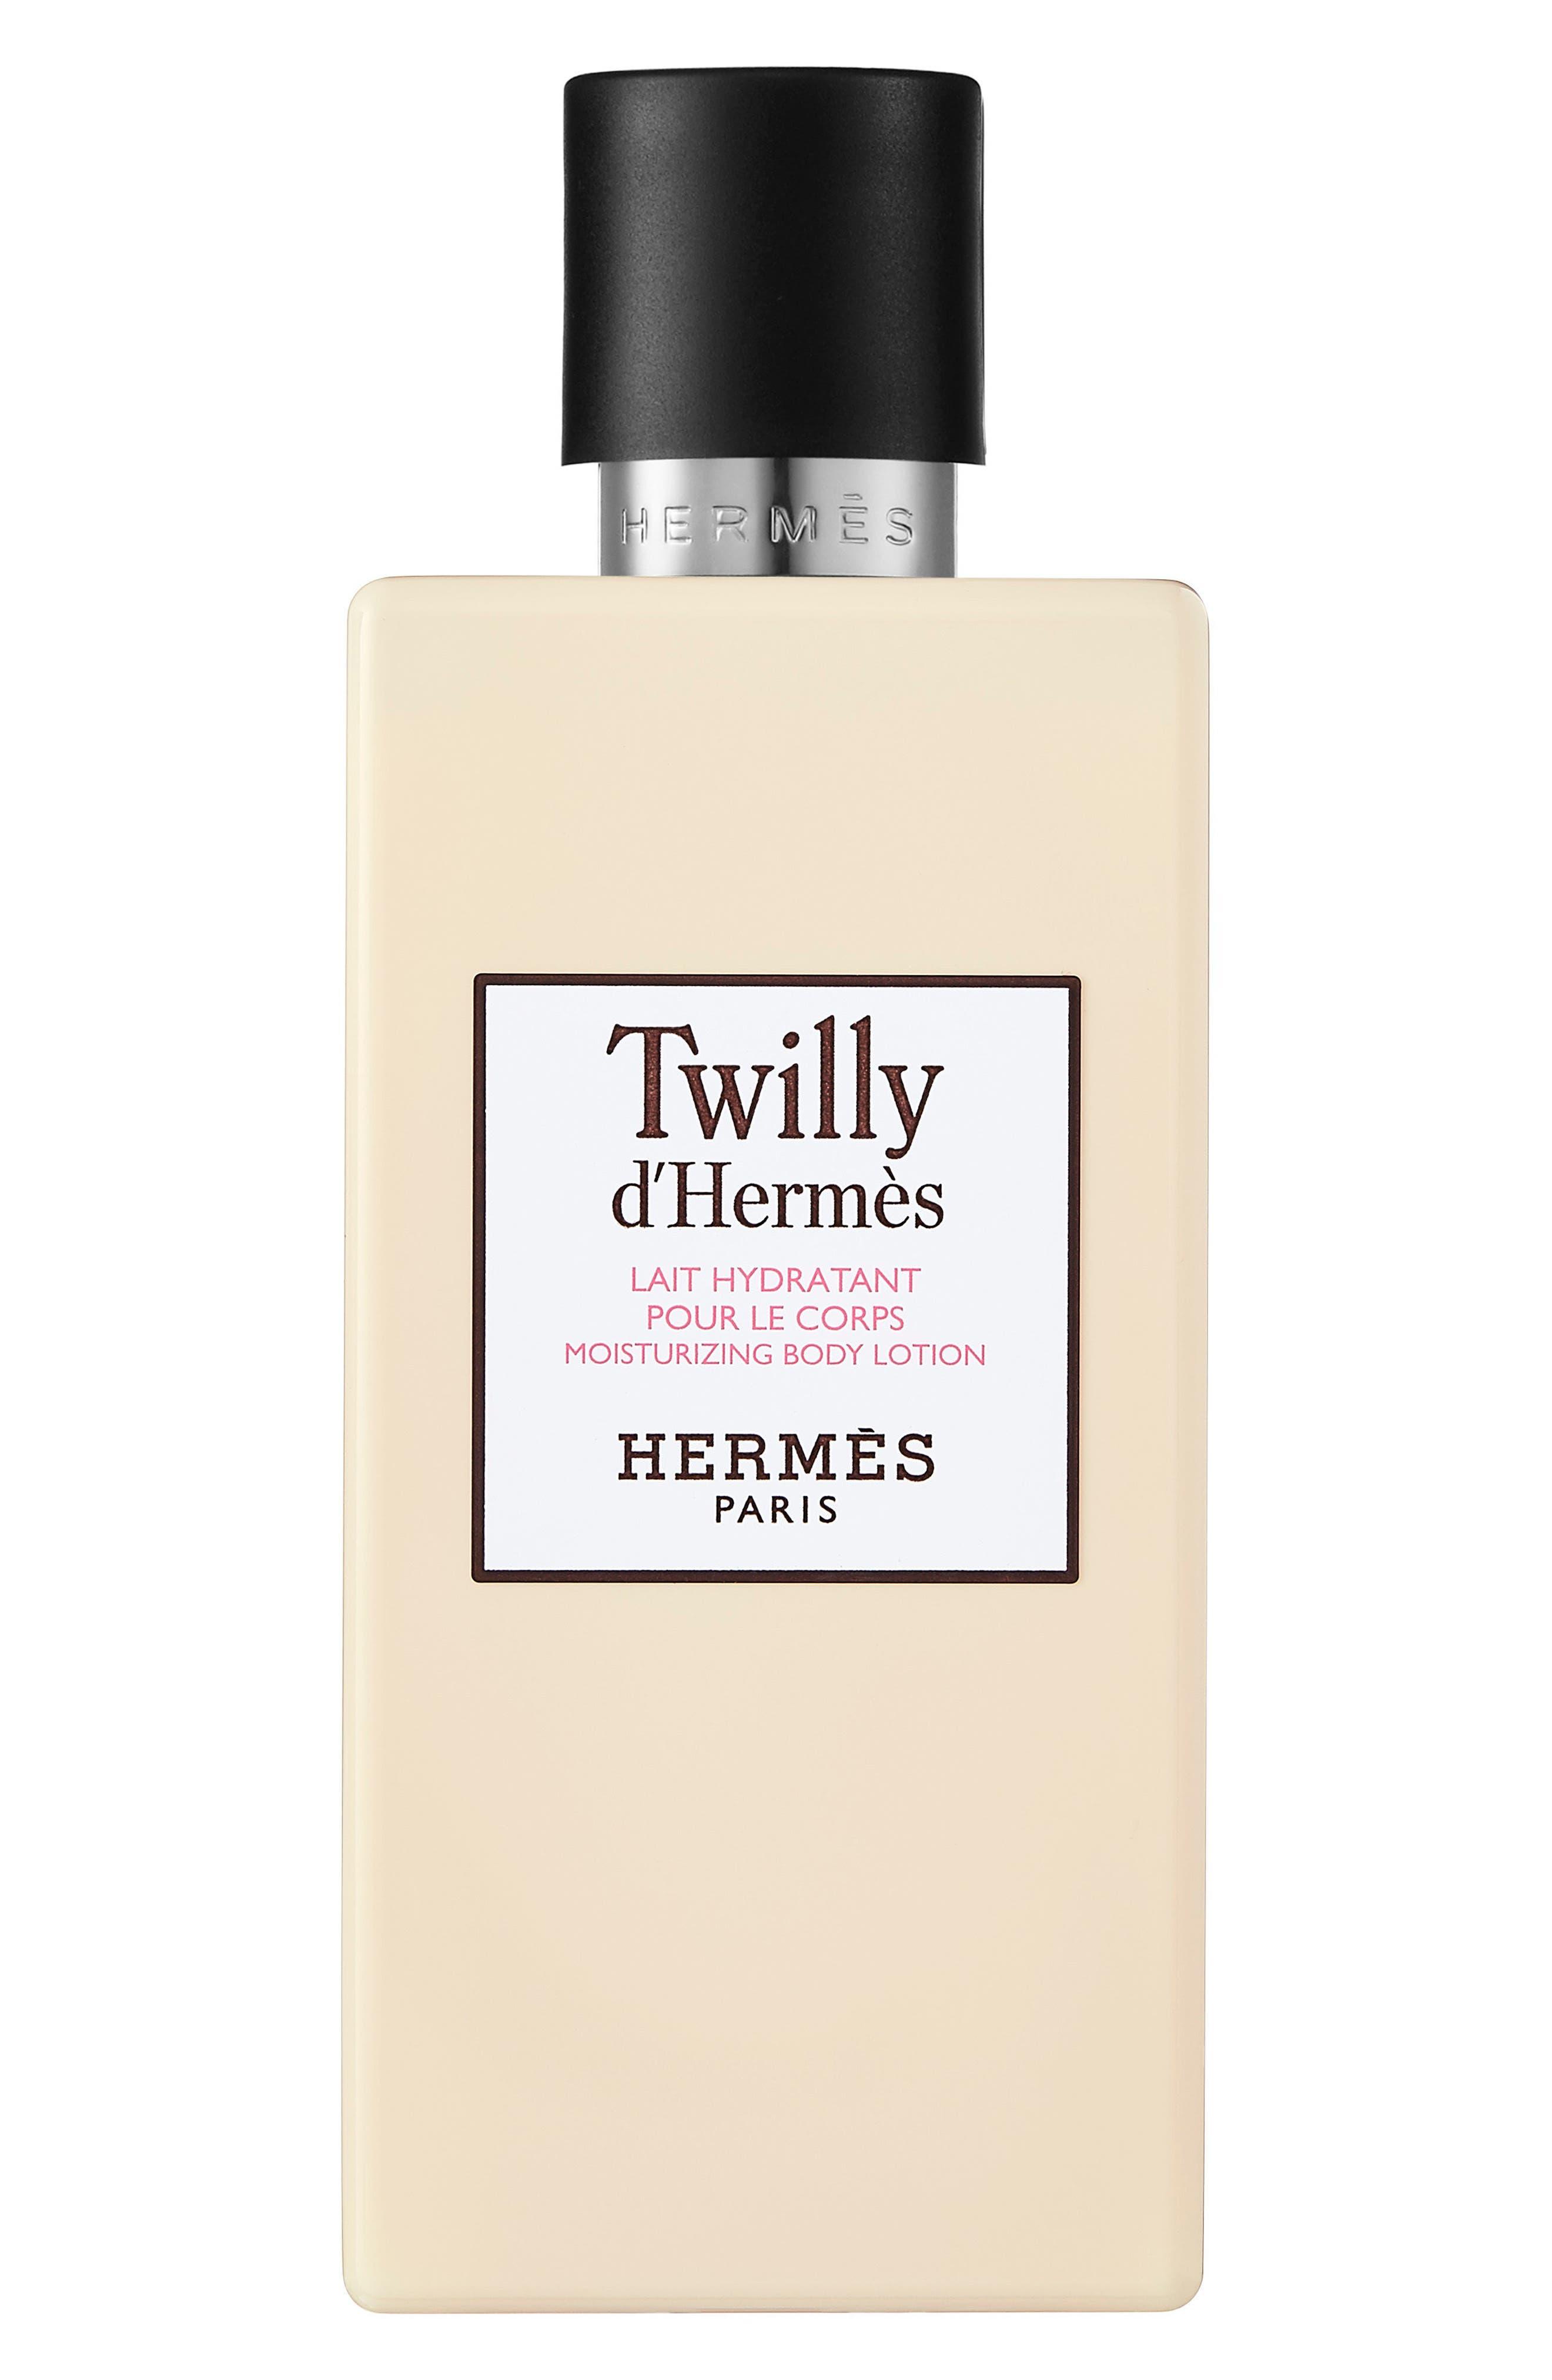 HERMÈS, Twilly d'Hermès - Moisturizing body lotion, Main thumbnail 1, color, NO COLOR